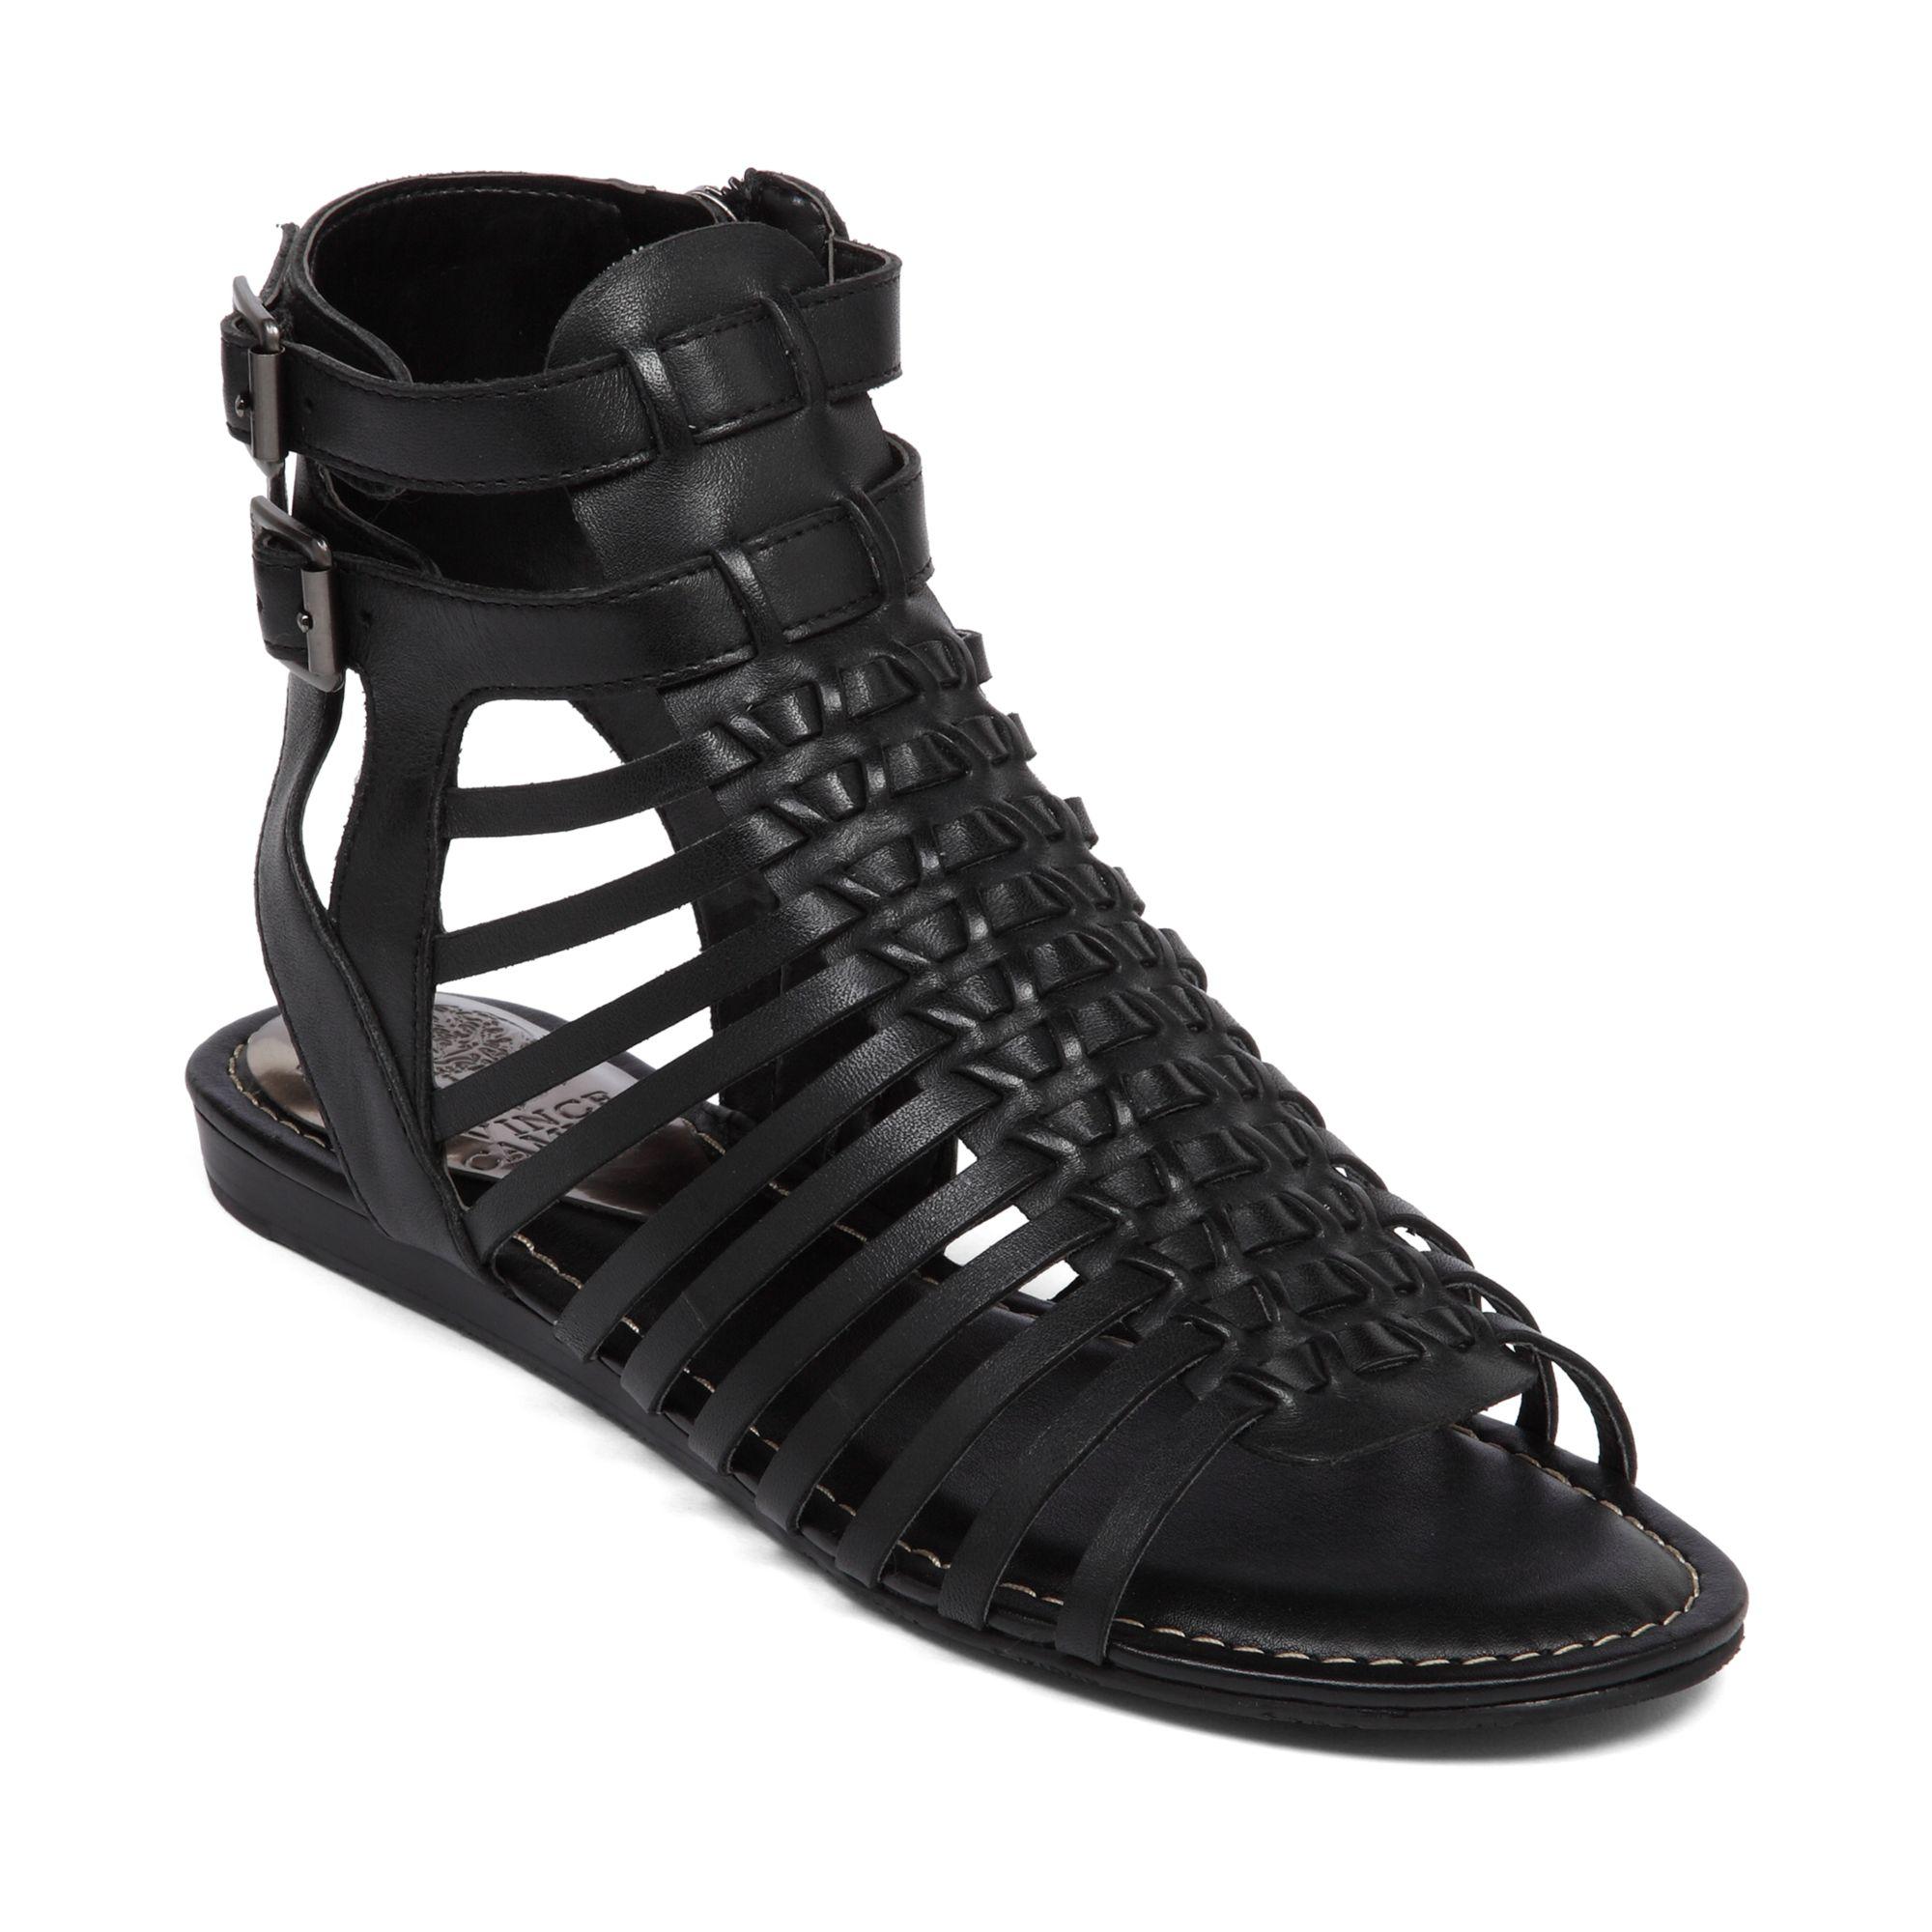 Vince Camuto Kensil Gladiator Sandals In Black Lyst